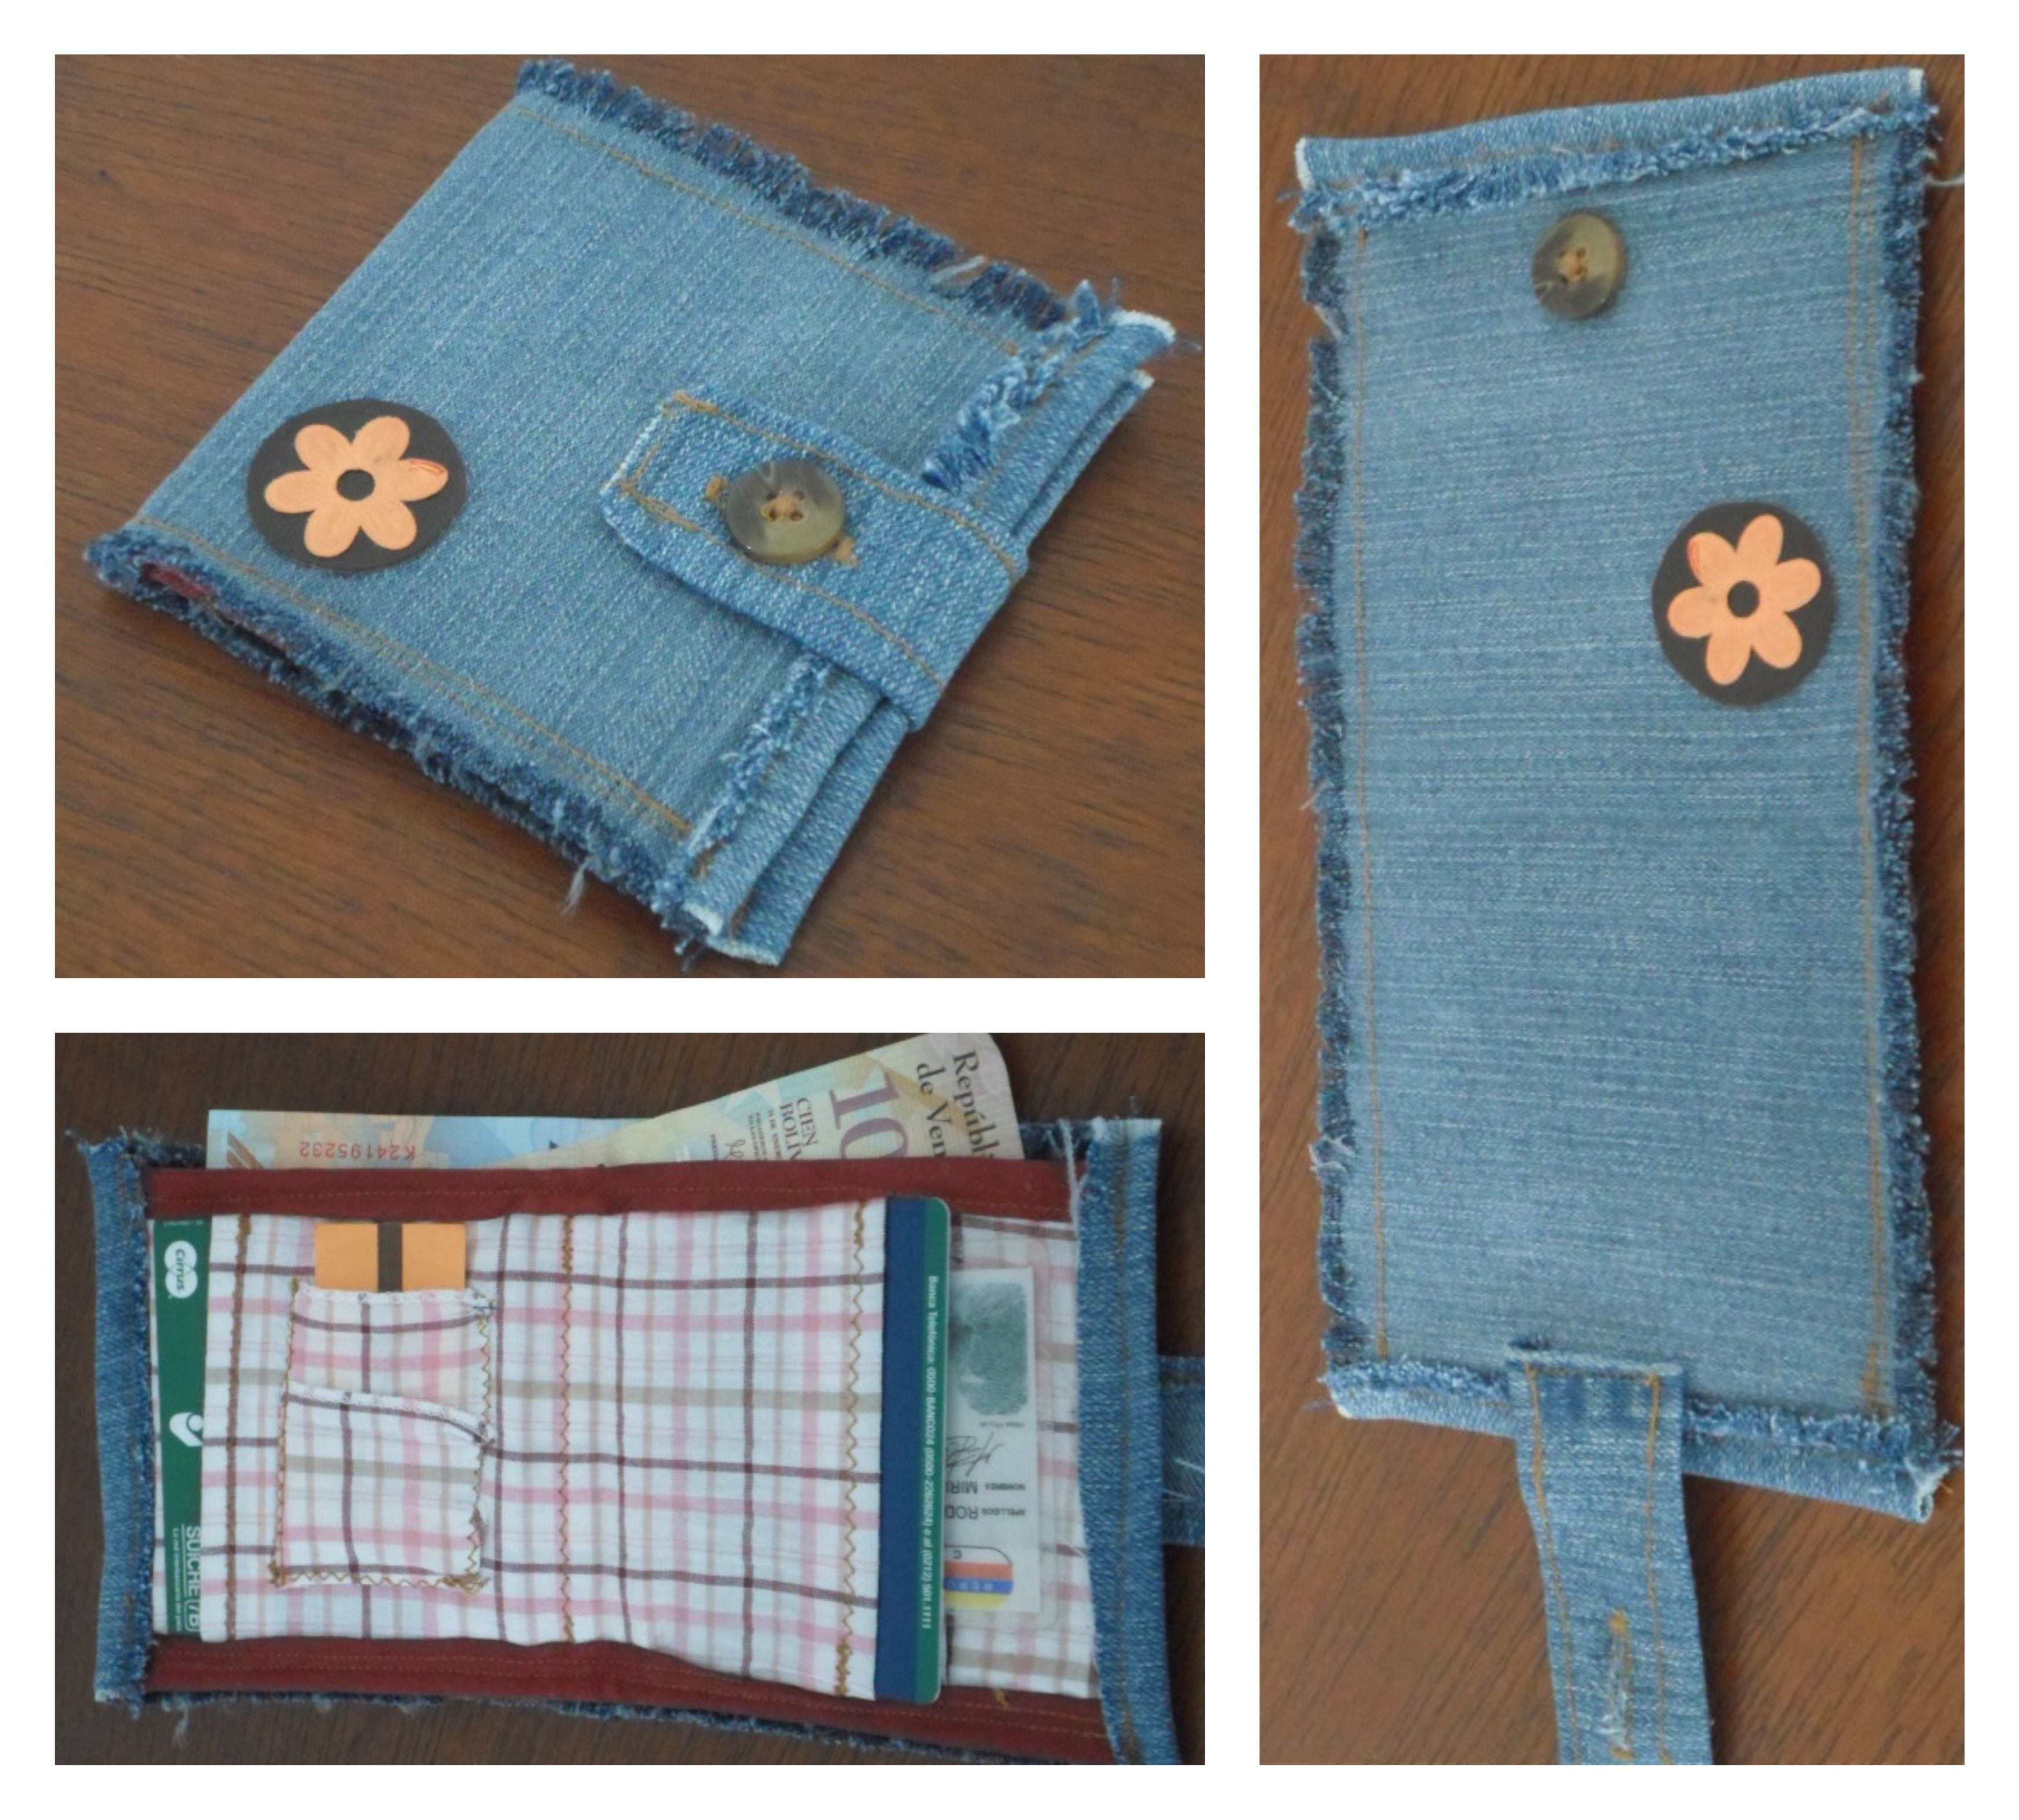 e2f15ef4e Billetera hecha en jeans | Carteras, Bolsos, Monederos, Billeteras ...